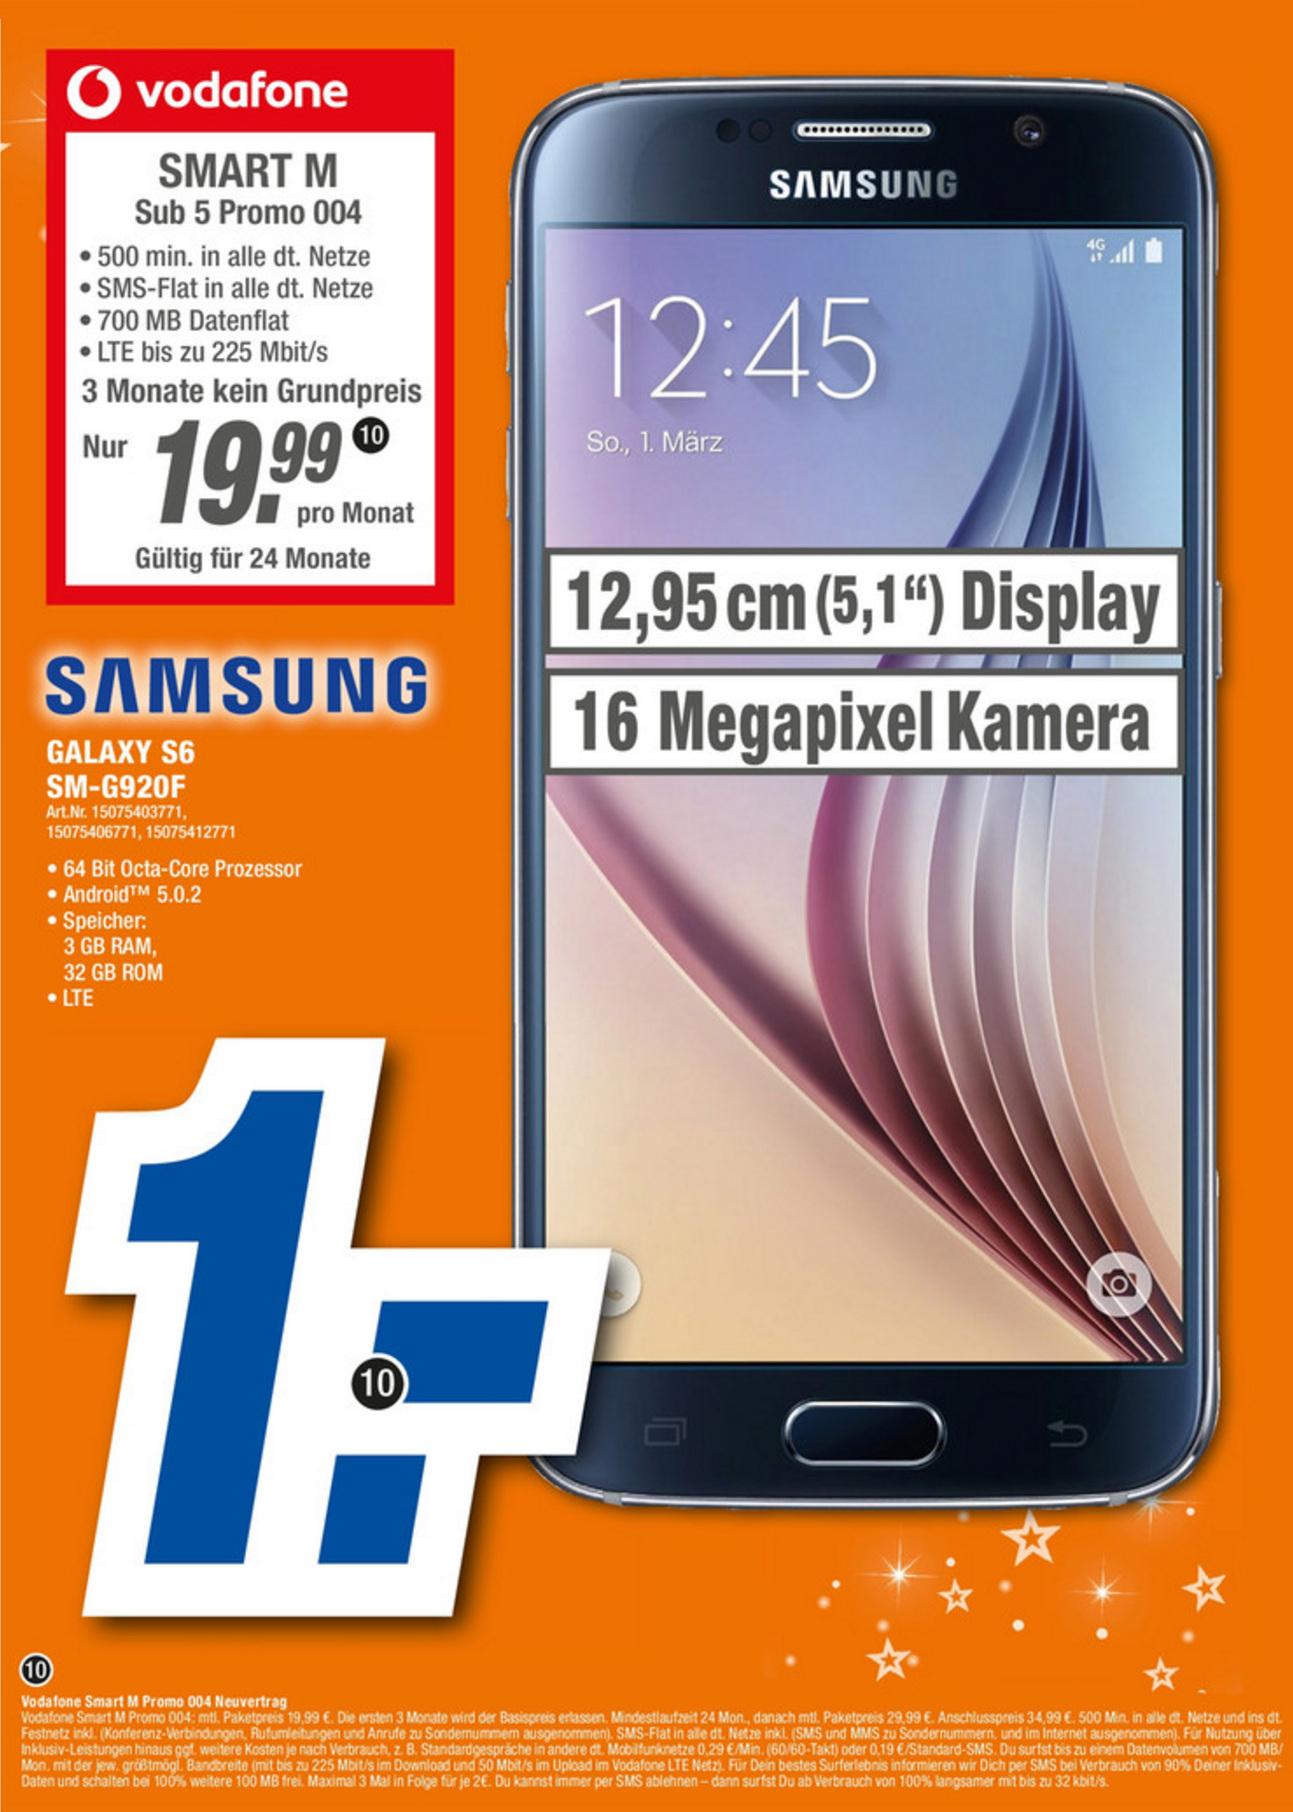 [expert Franken] Vodafone Smart M (500min, 700MB LTE, SMS-Flat) inkl. Galaxy S6 für 19,99€/Monat